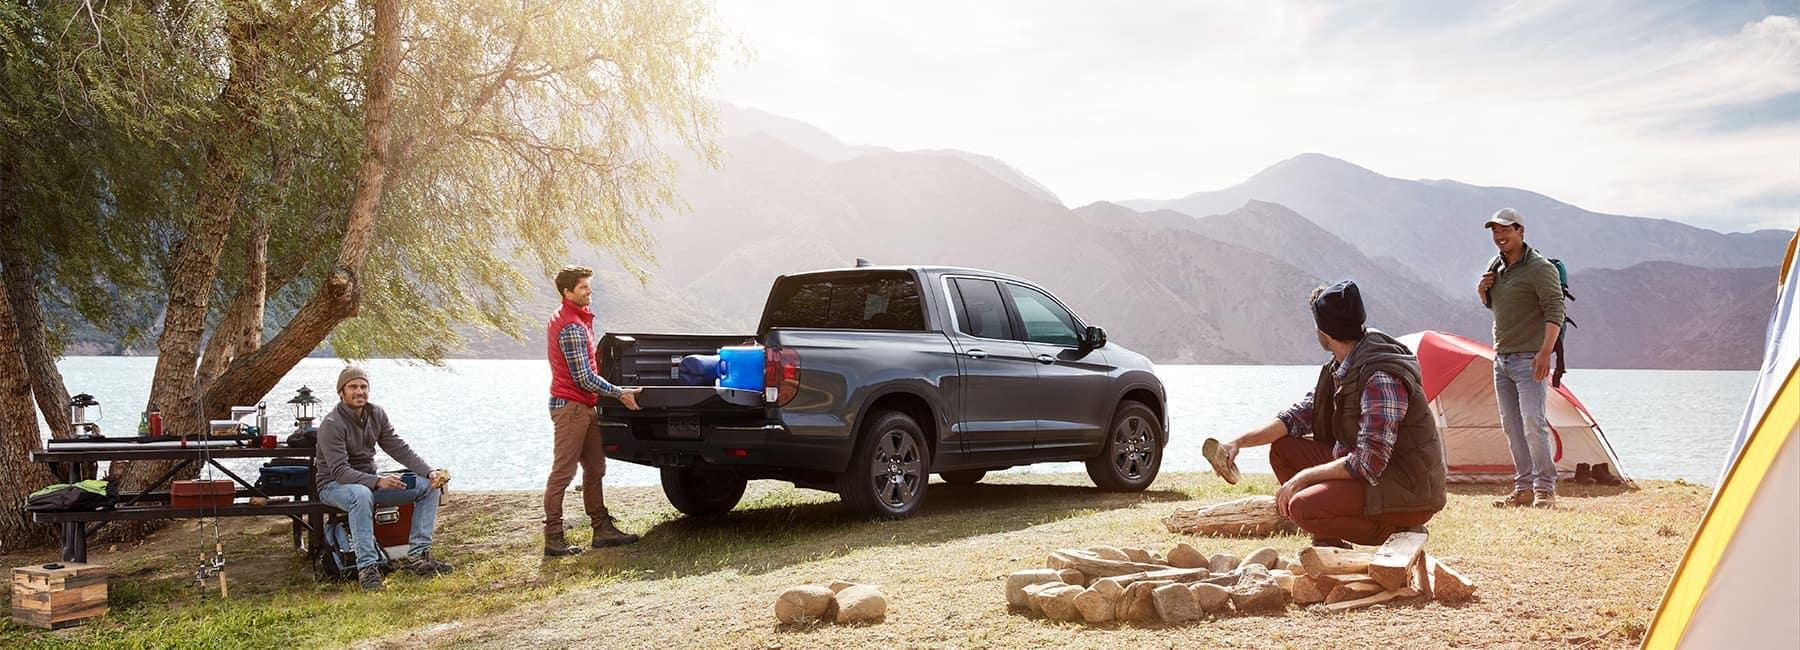 2020 Honda Ridgeline camping